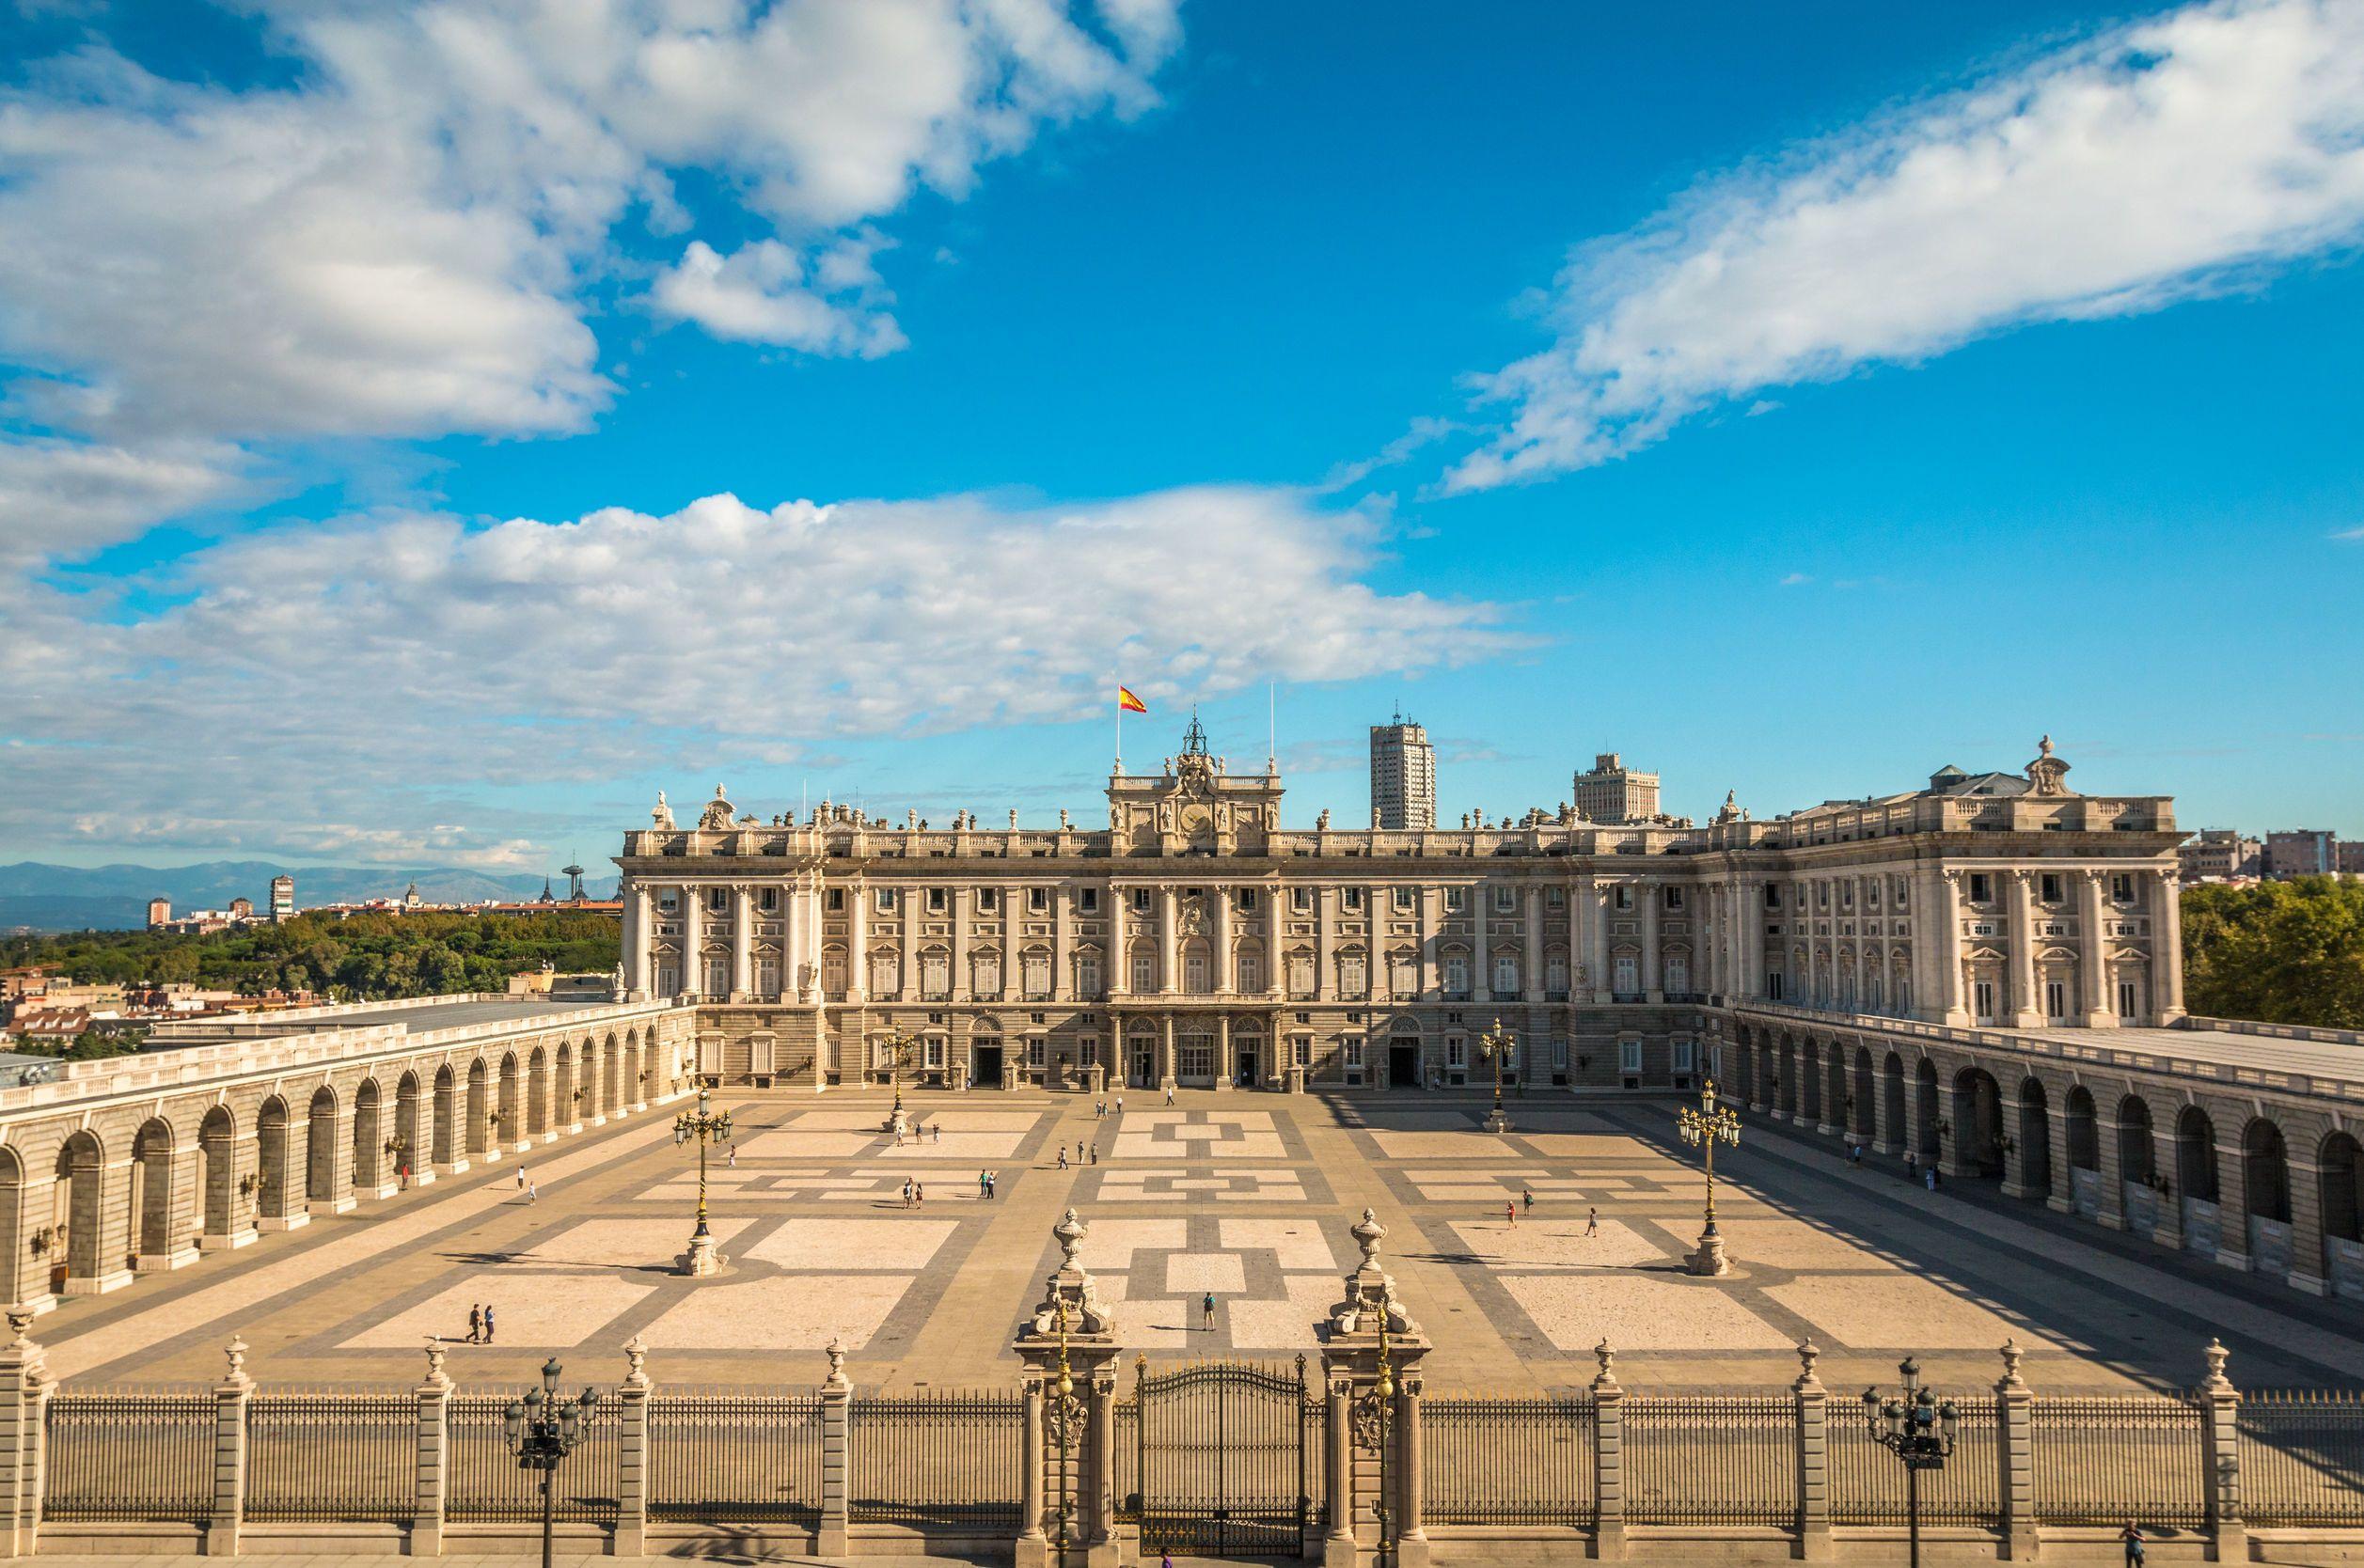 Skip-the-Line Royal Palace Tour